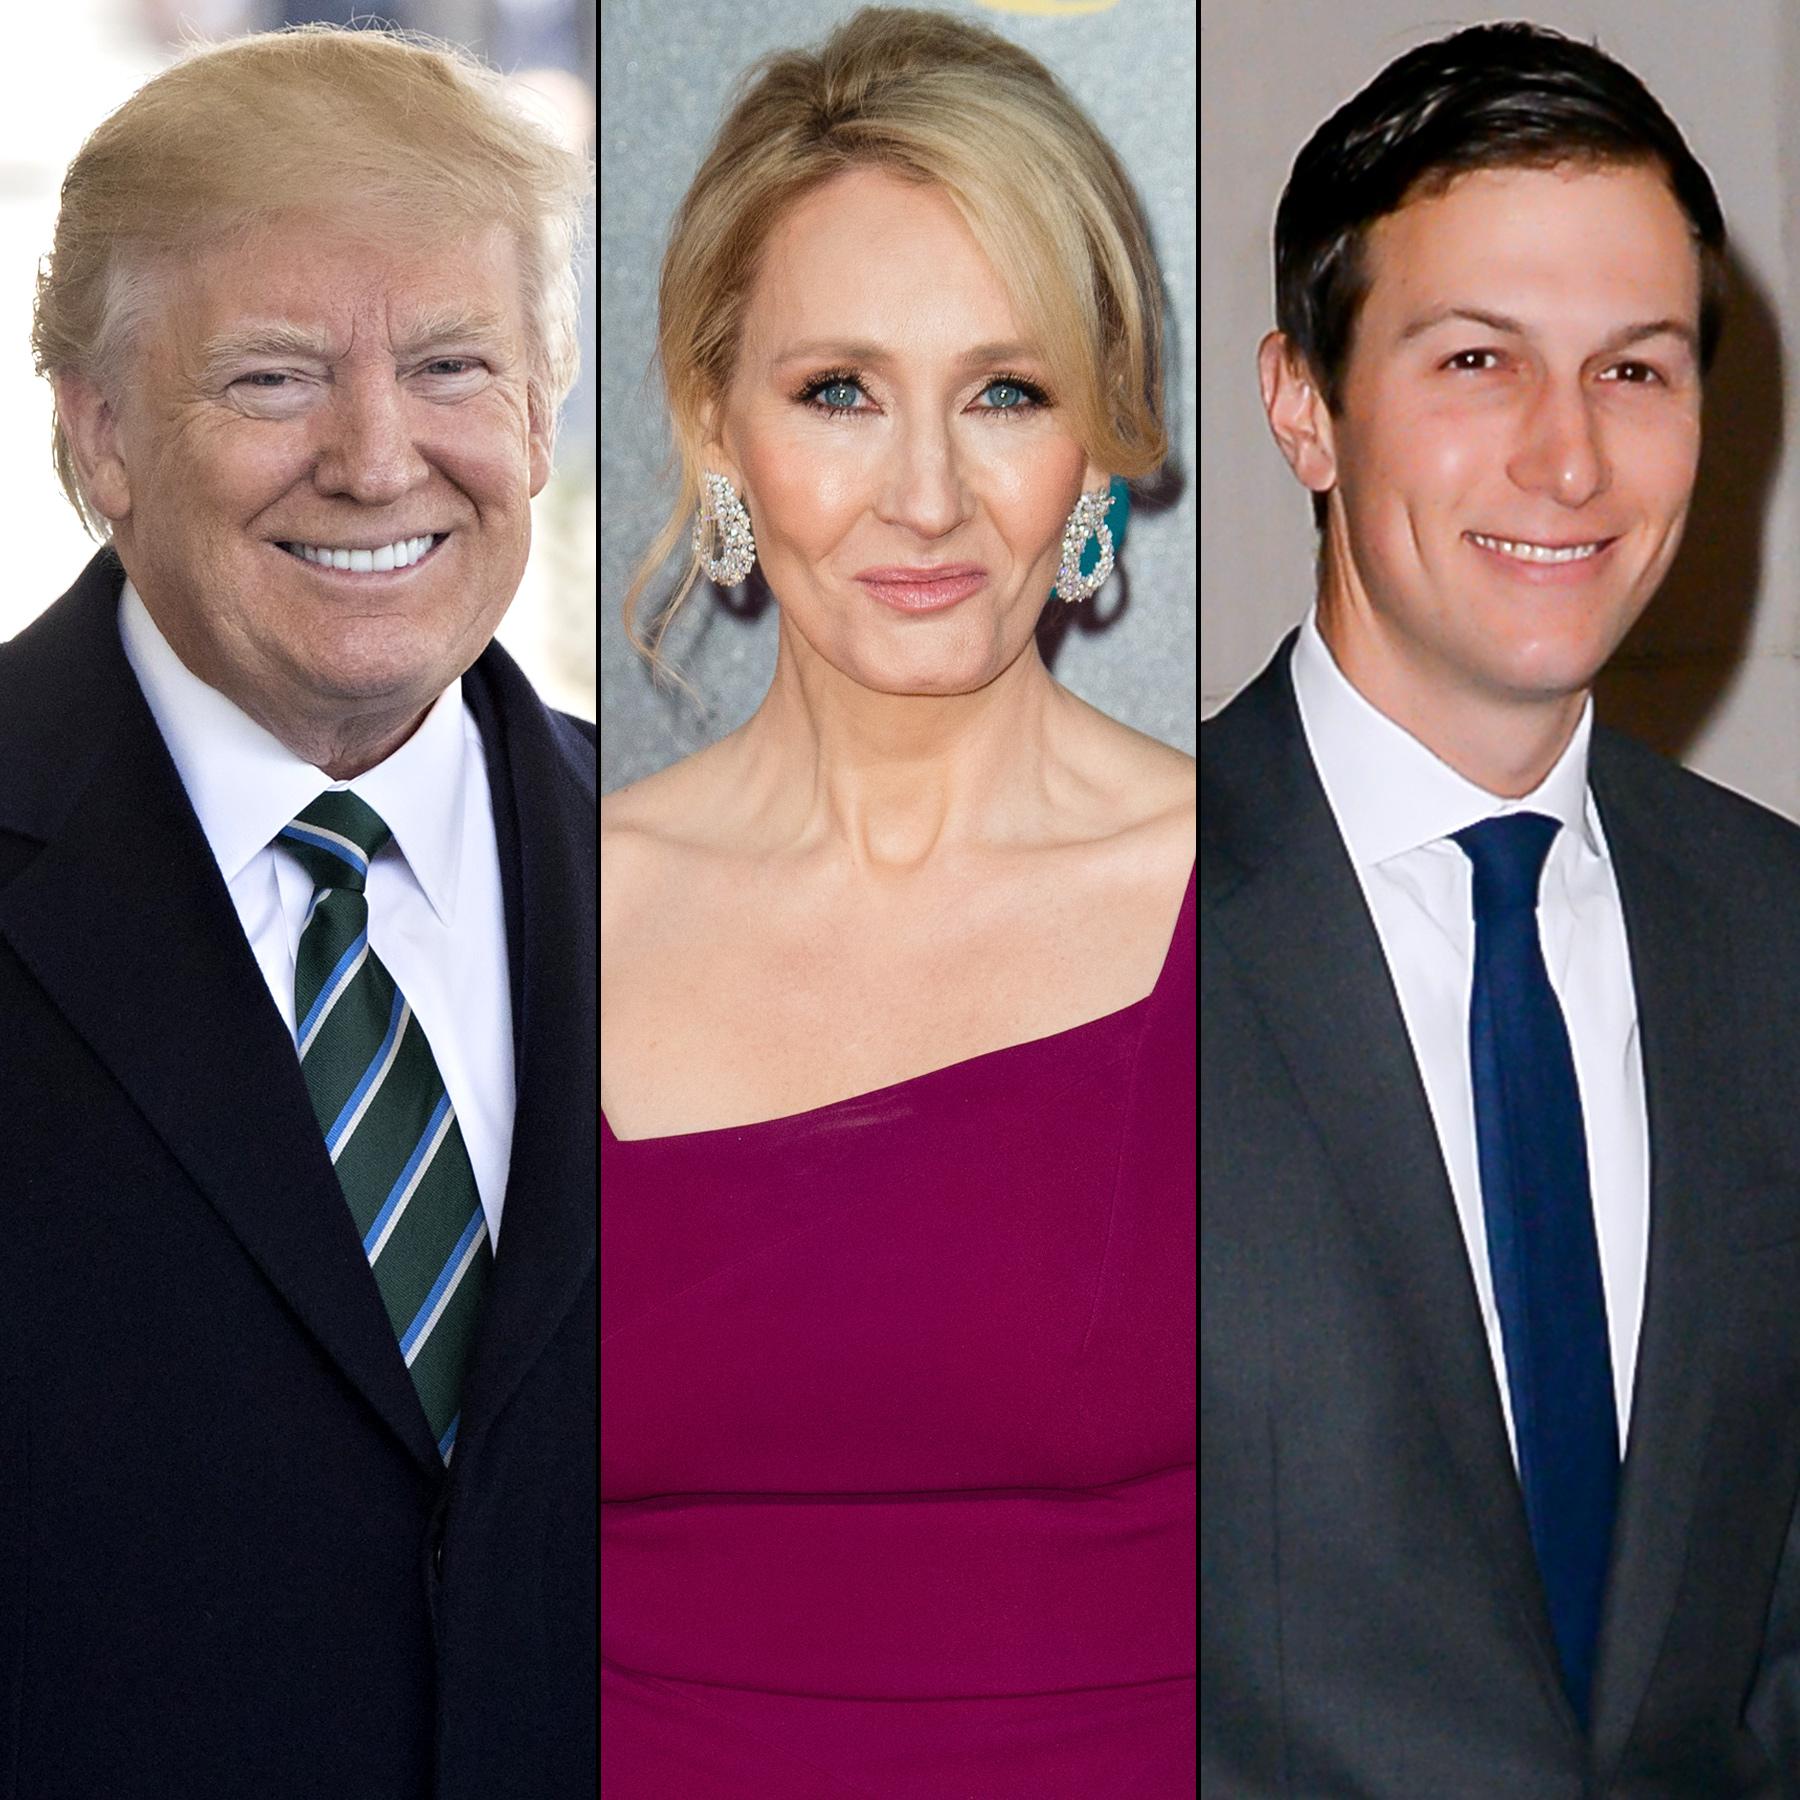 Trump, Rowling & Kushner